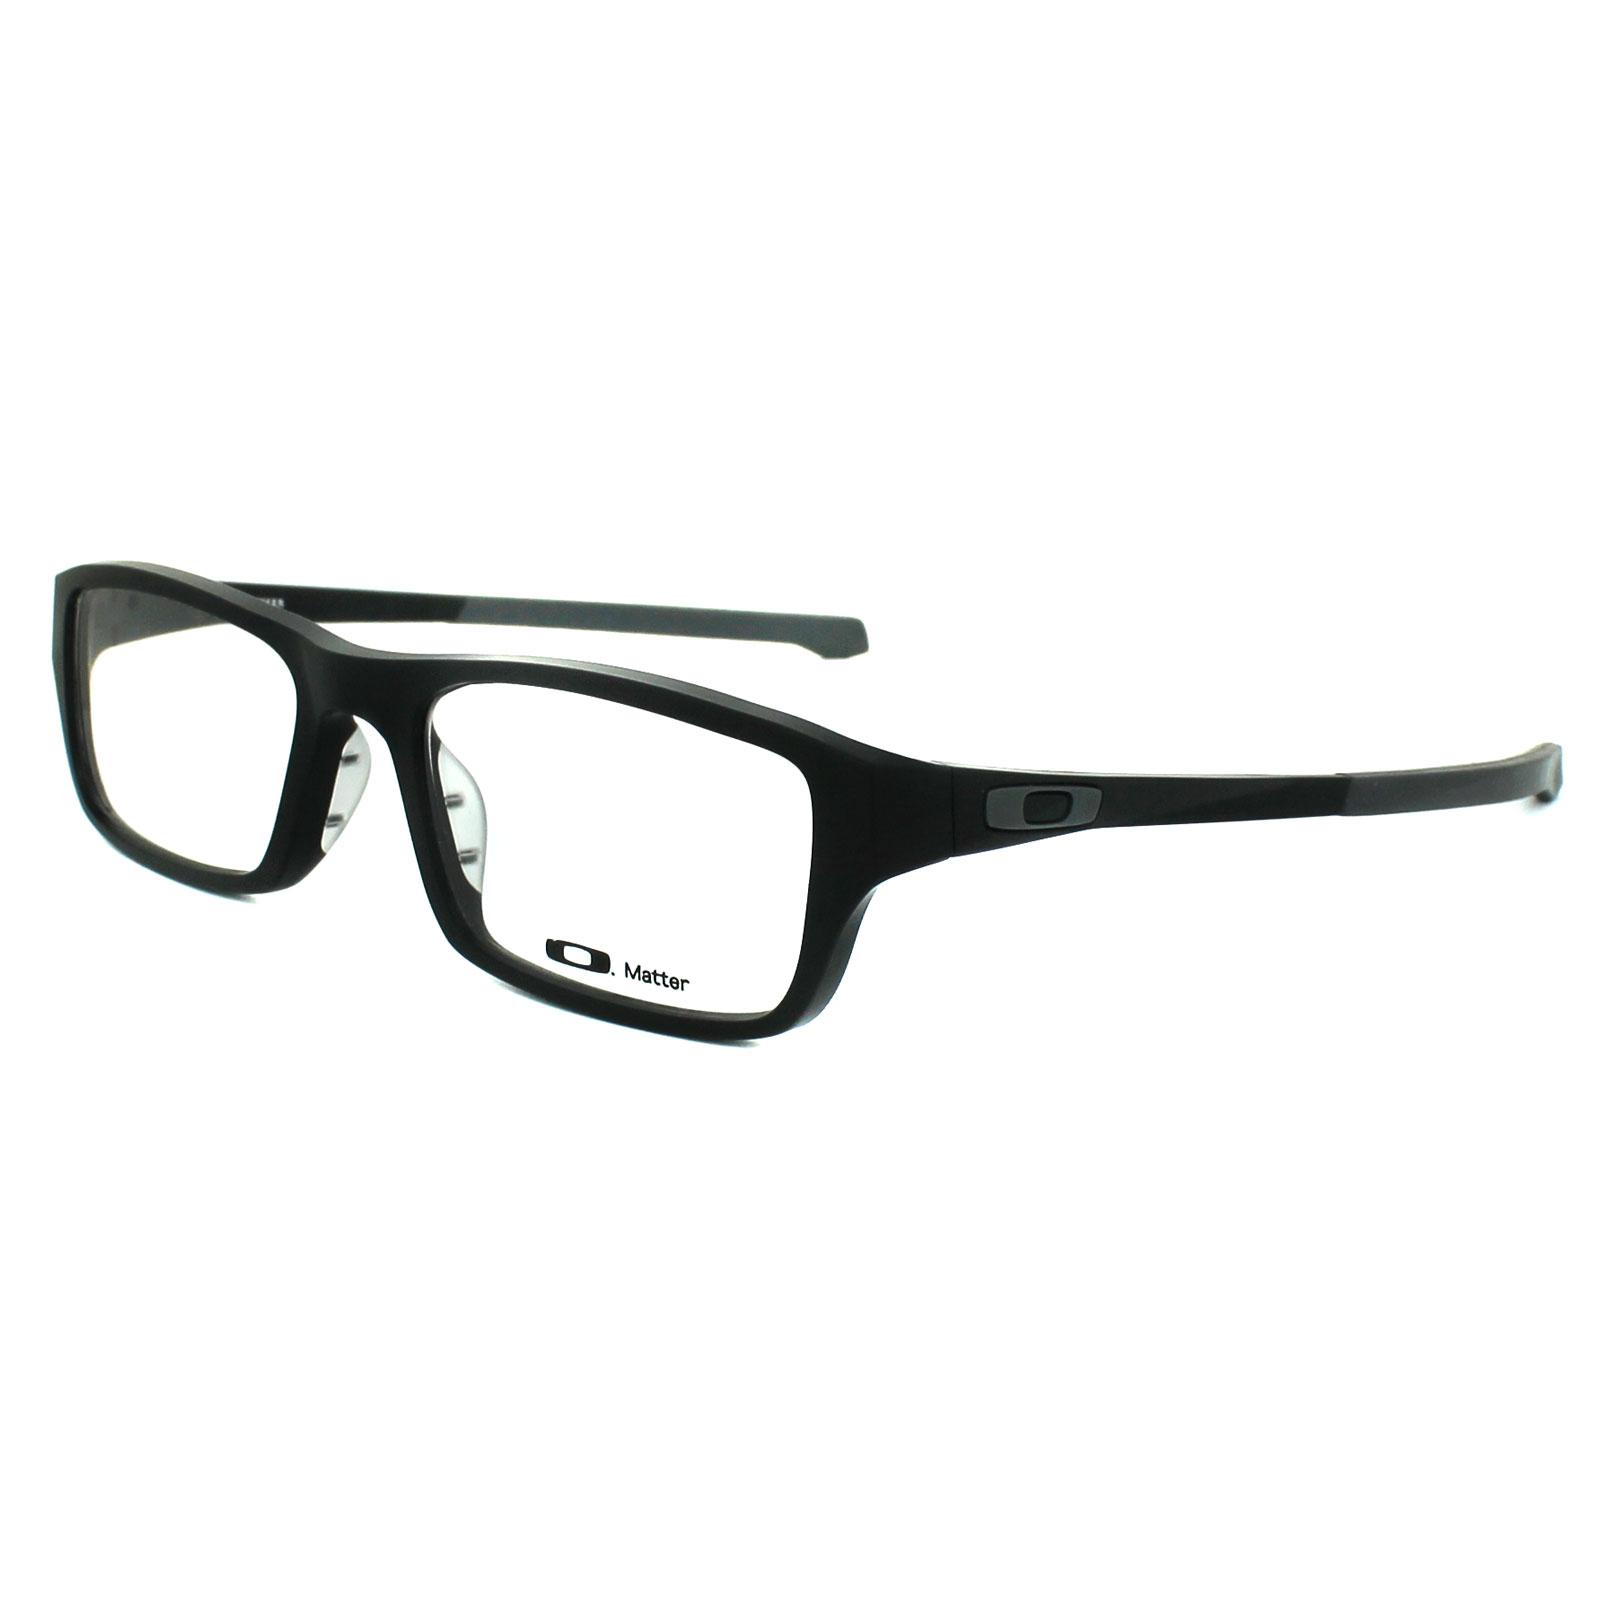 7665ab8398d Cheap Oakley Chamfer Glasses Frames - Discounted Sunglasses